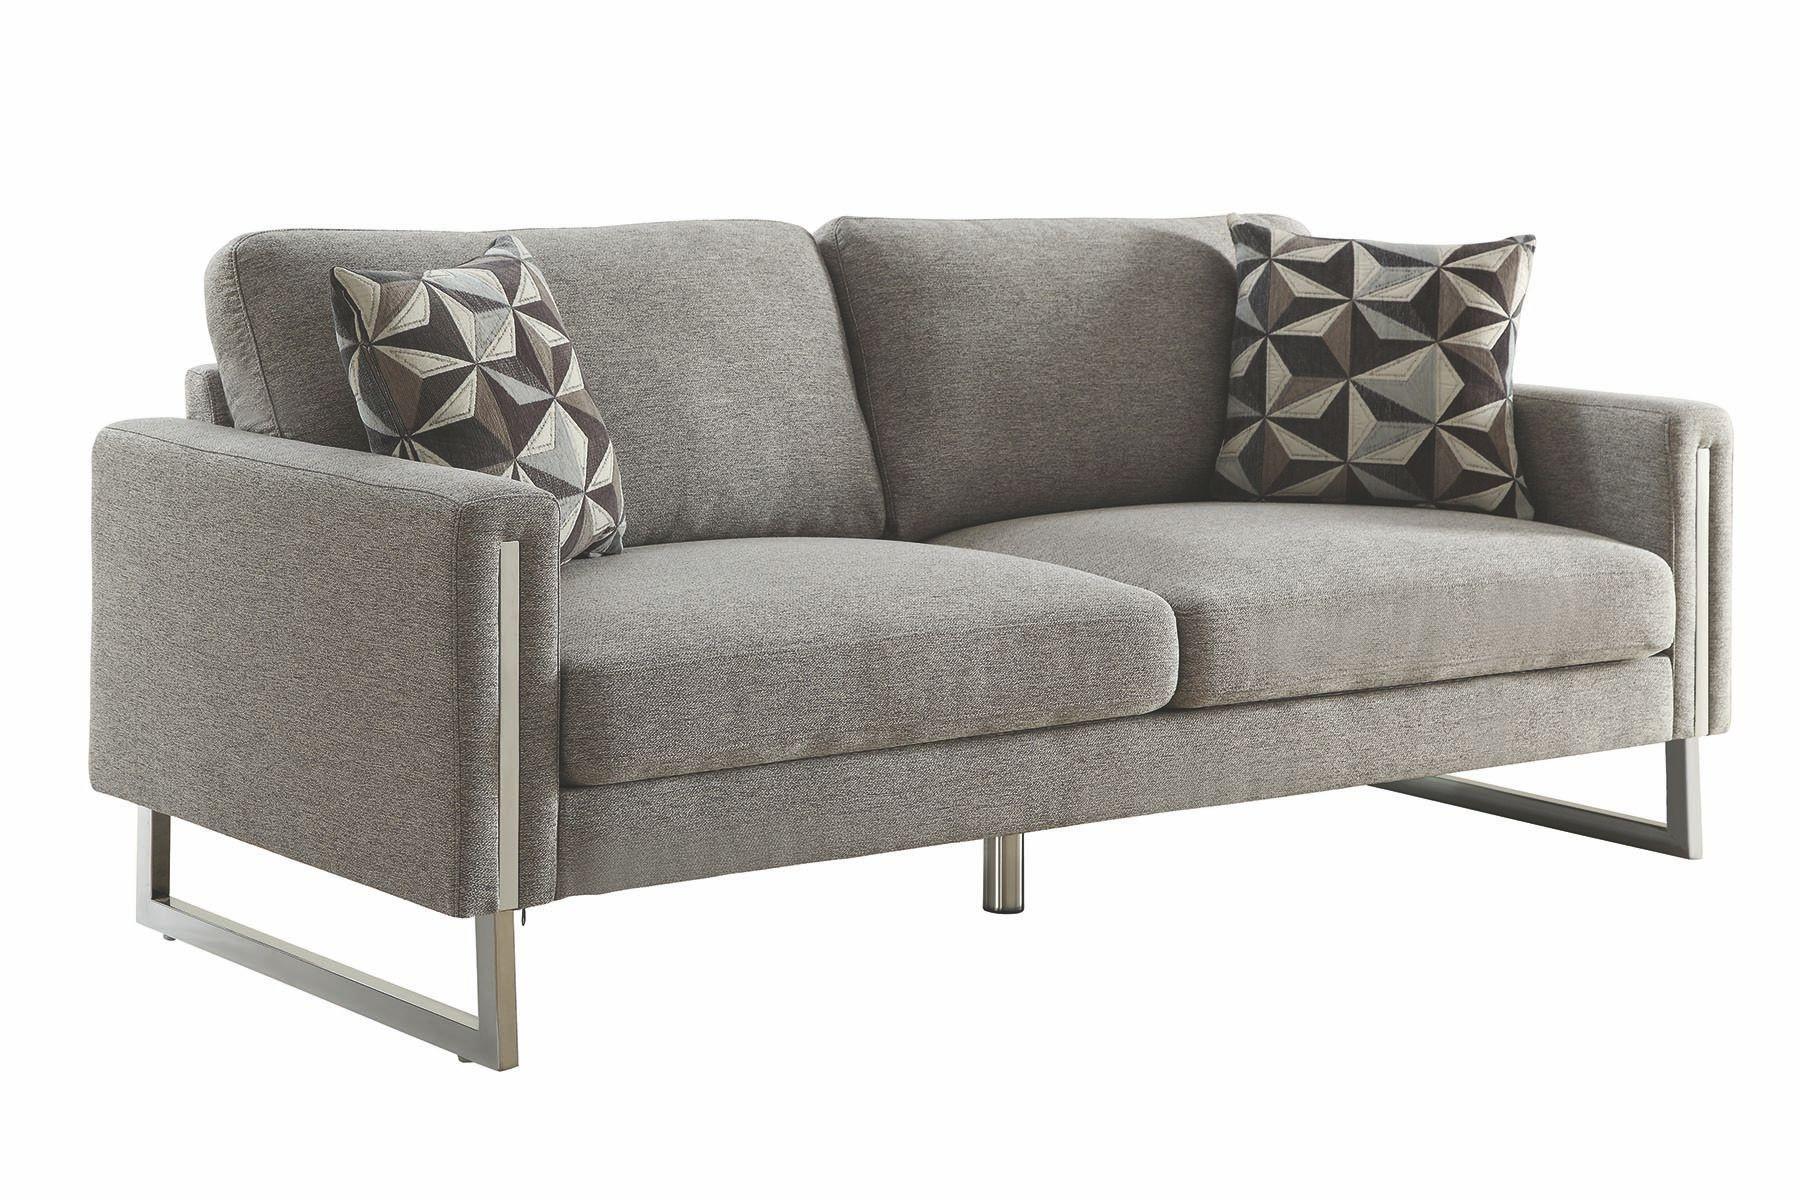 Stellan Grey Sofa from Coaster